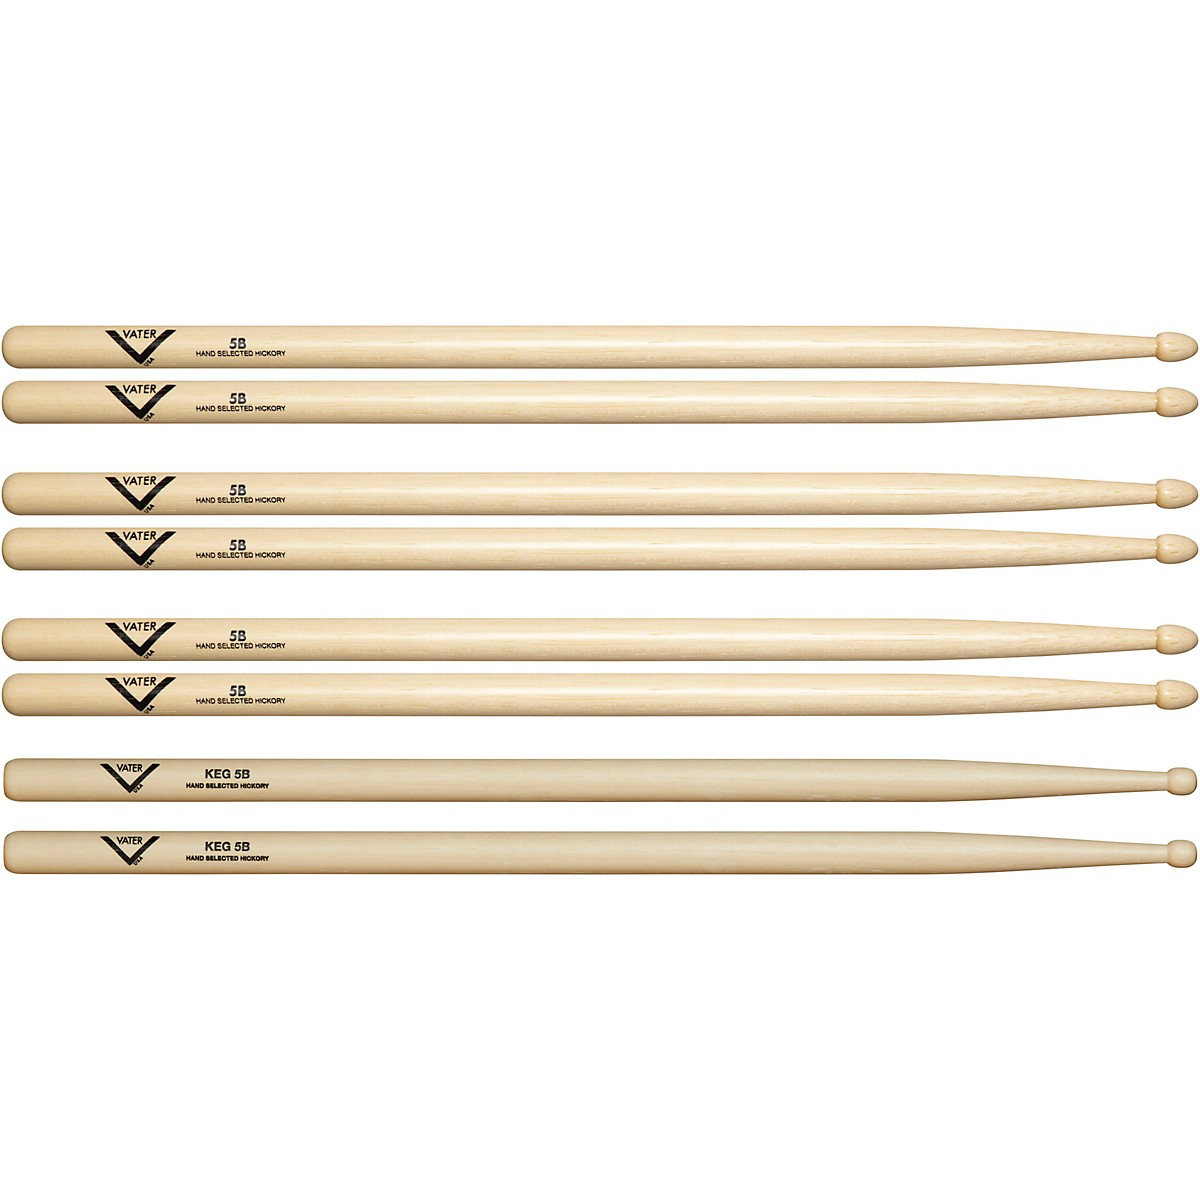 Vater Buy 3 5B Wood Drumsticks, Get 1 Free KEG 5B